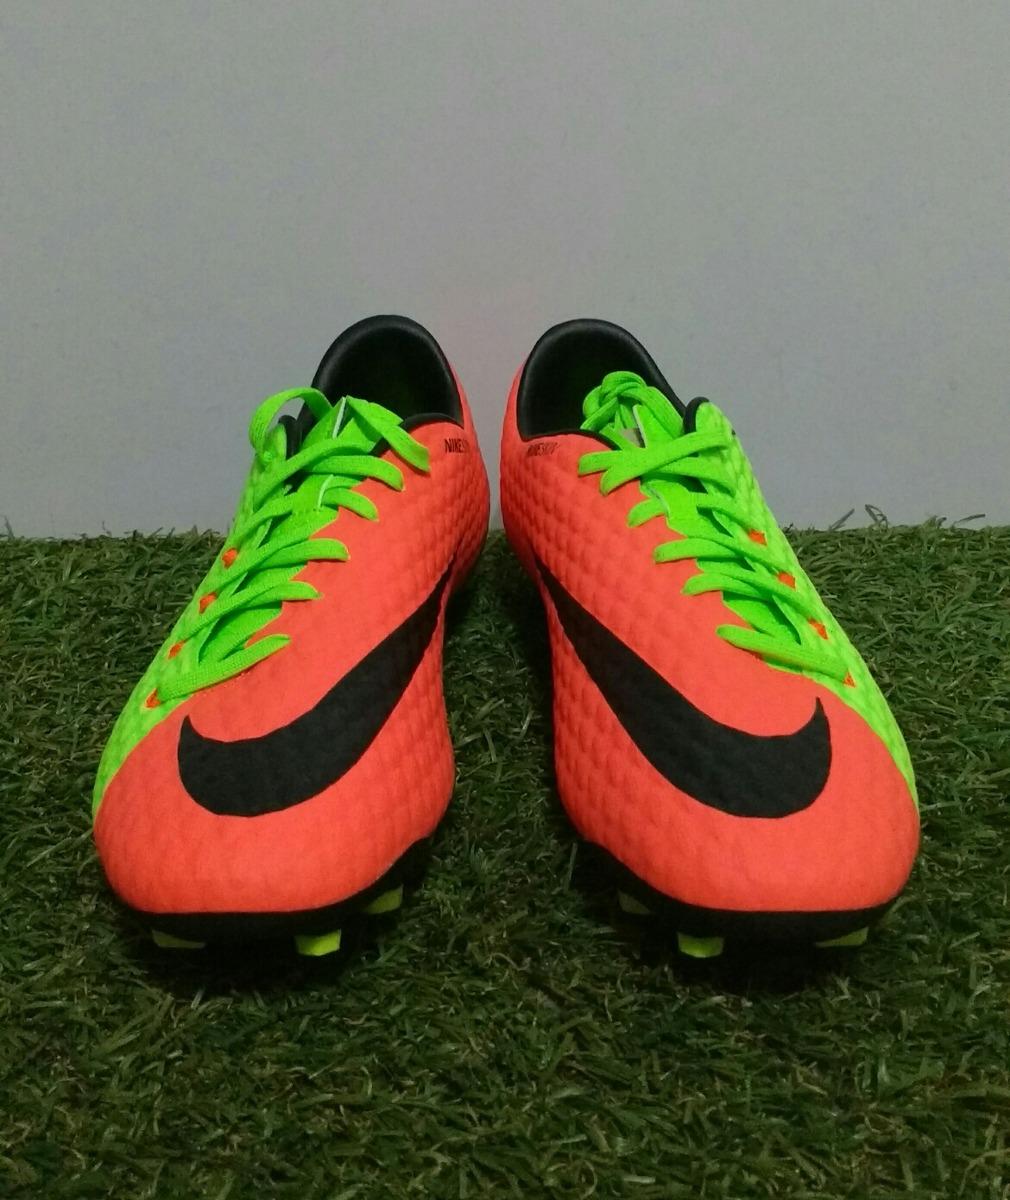 Tacos De Fútbol Nike Hypervenom Phelon Iii Fg -   850.00 en Mercado ... 5f3acebc9ac63